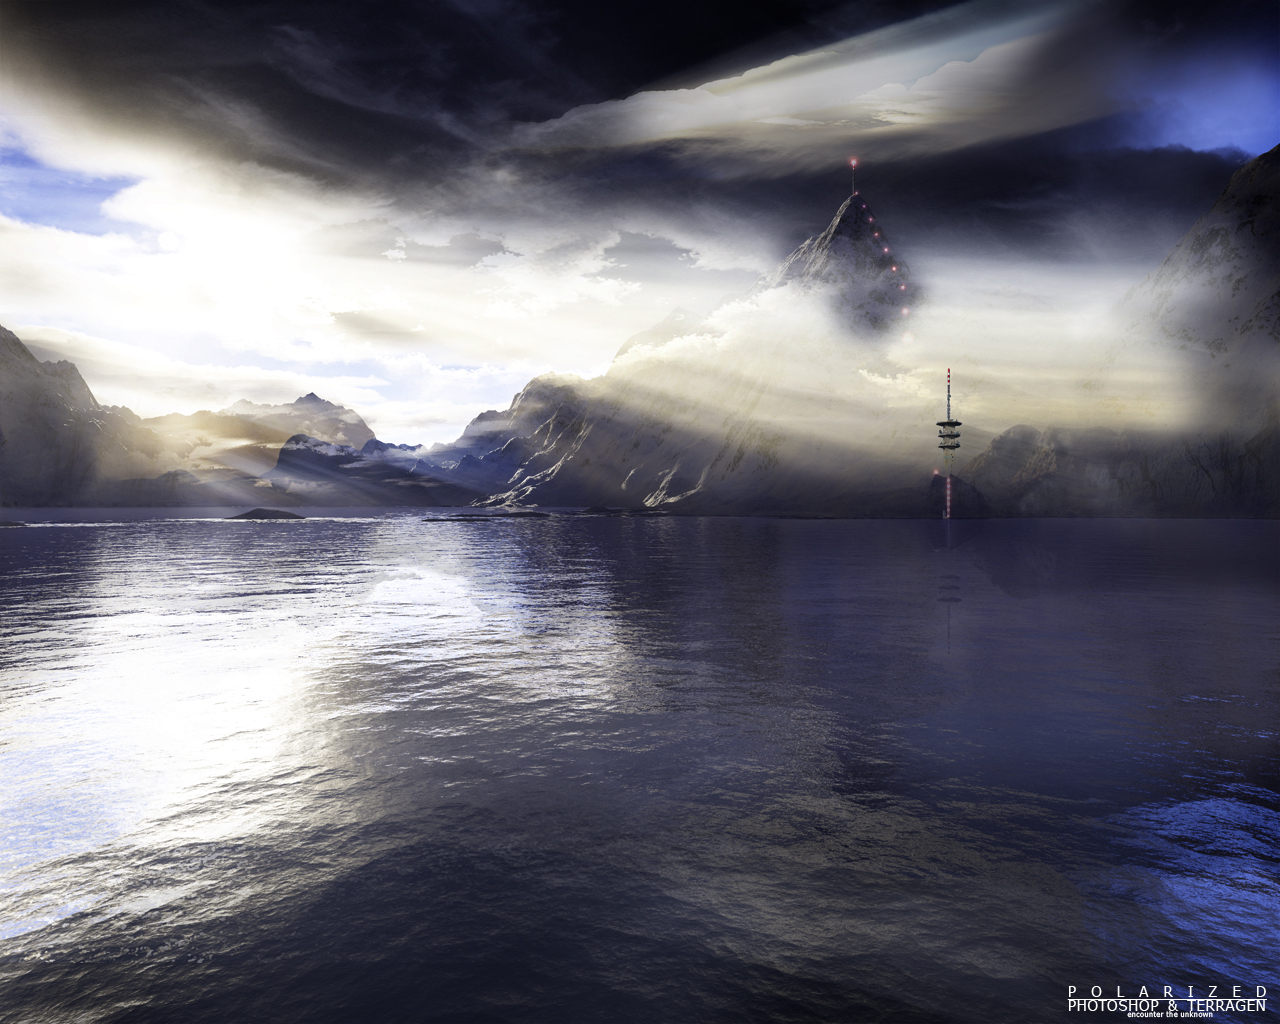 Terragen - Polarized